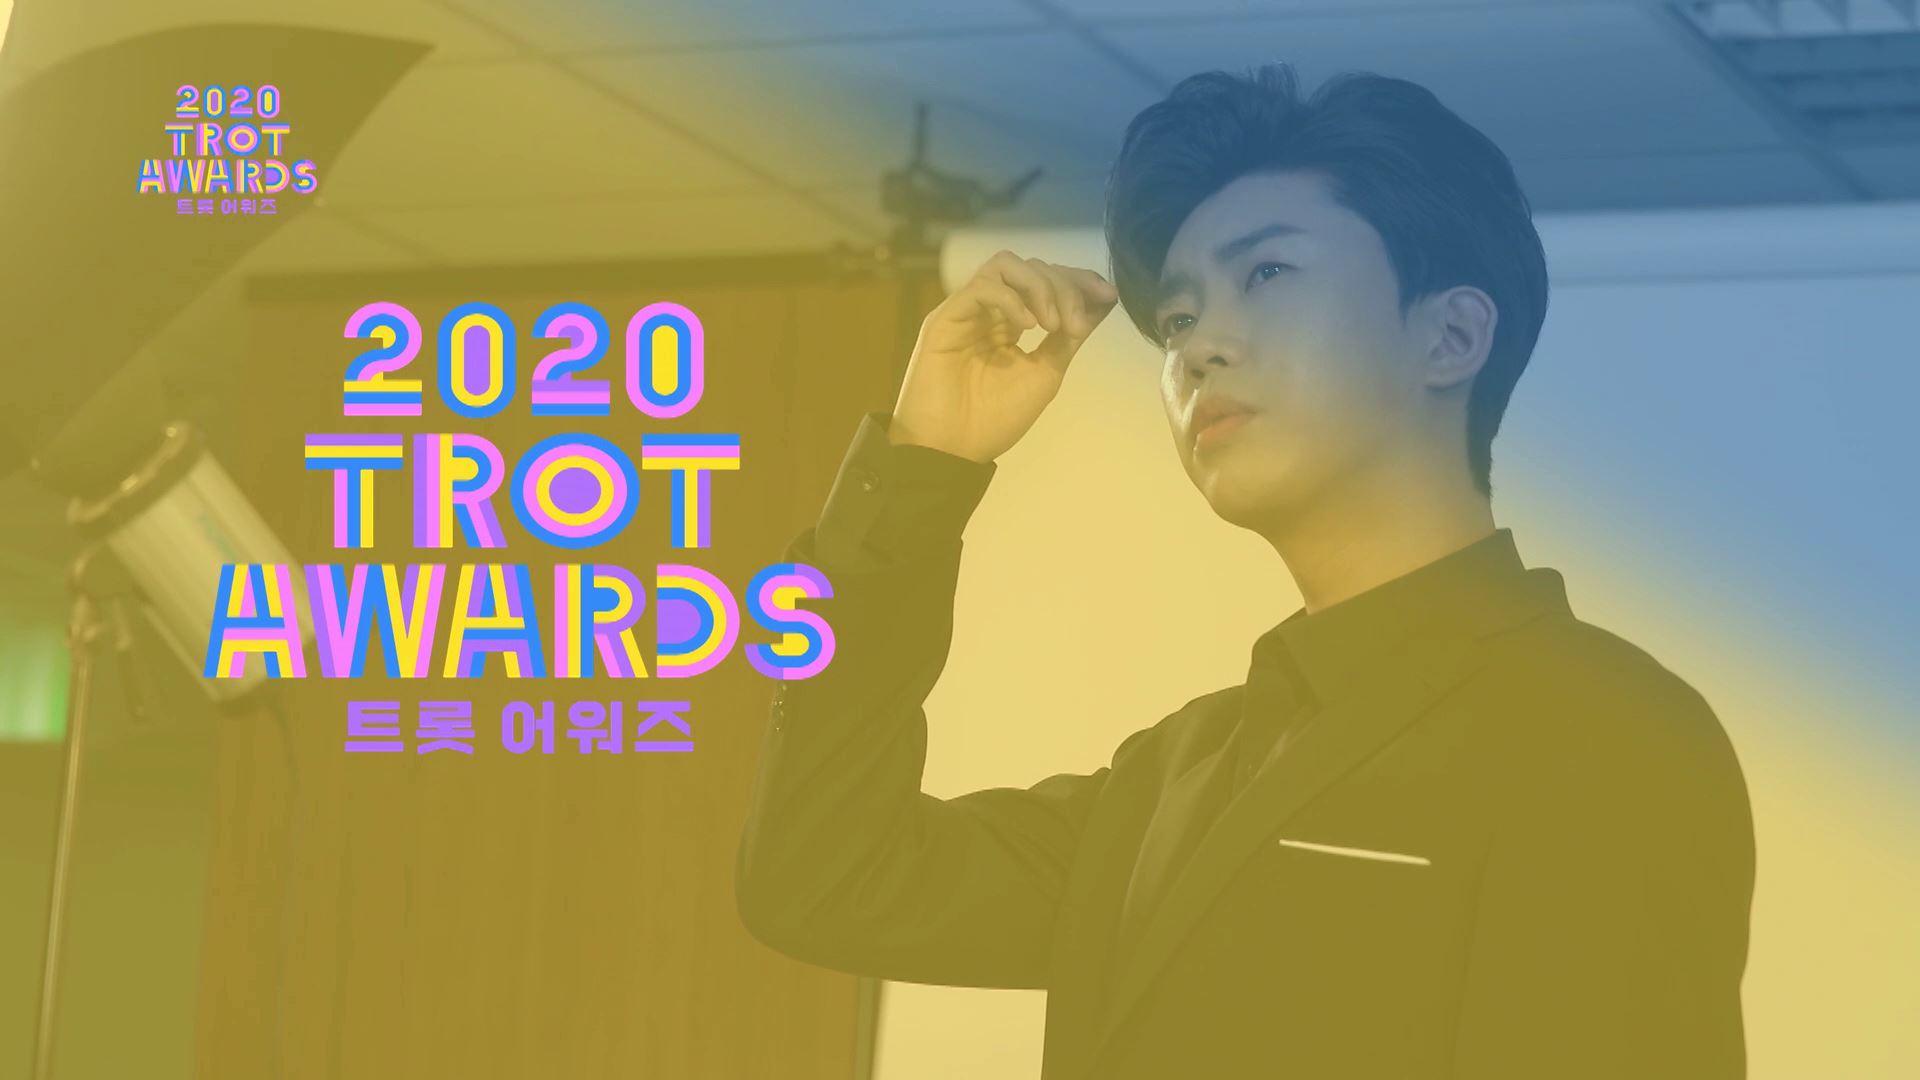 MC 임영웅과 함께하는 '2020 트롯 어워즈'